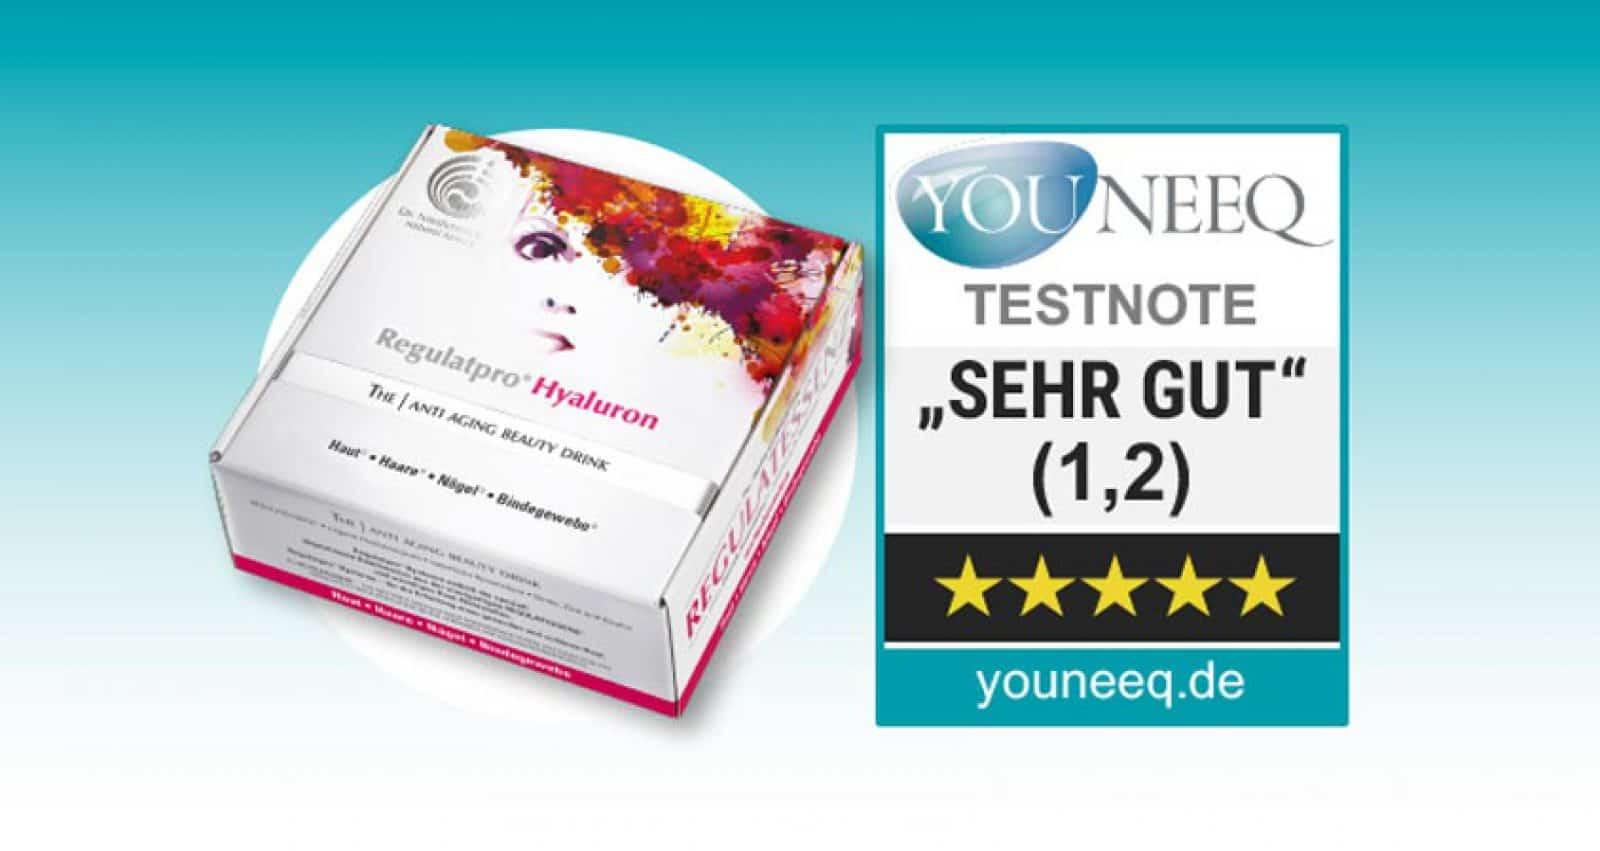 Regulatpro Hyaluron Drink Test